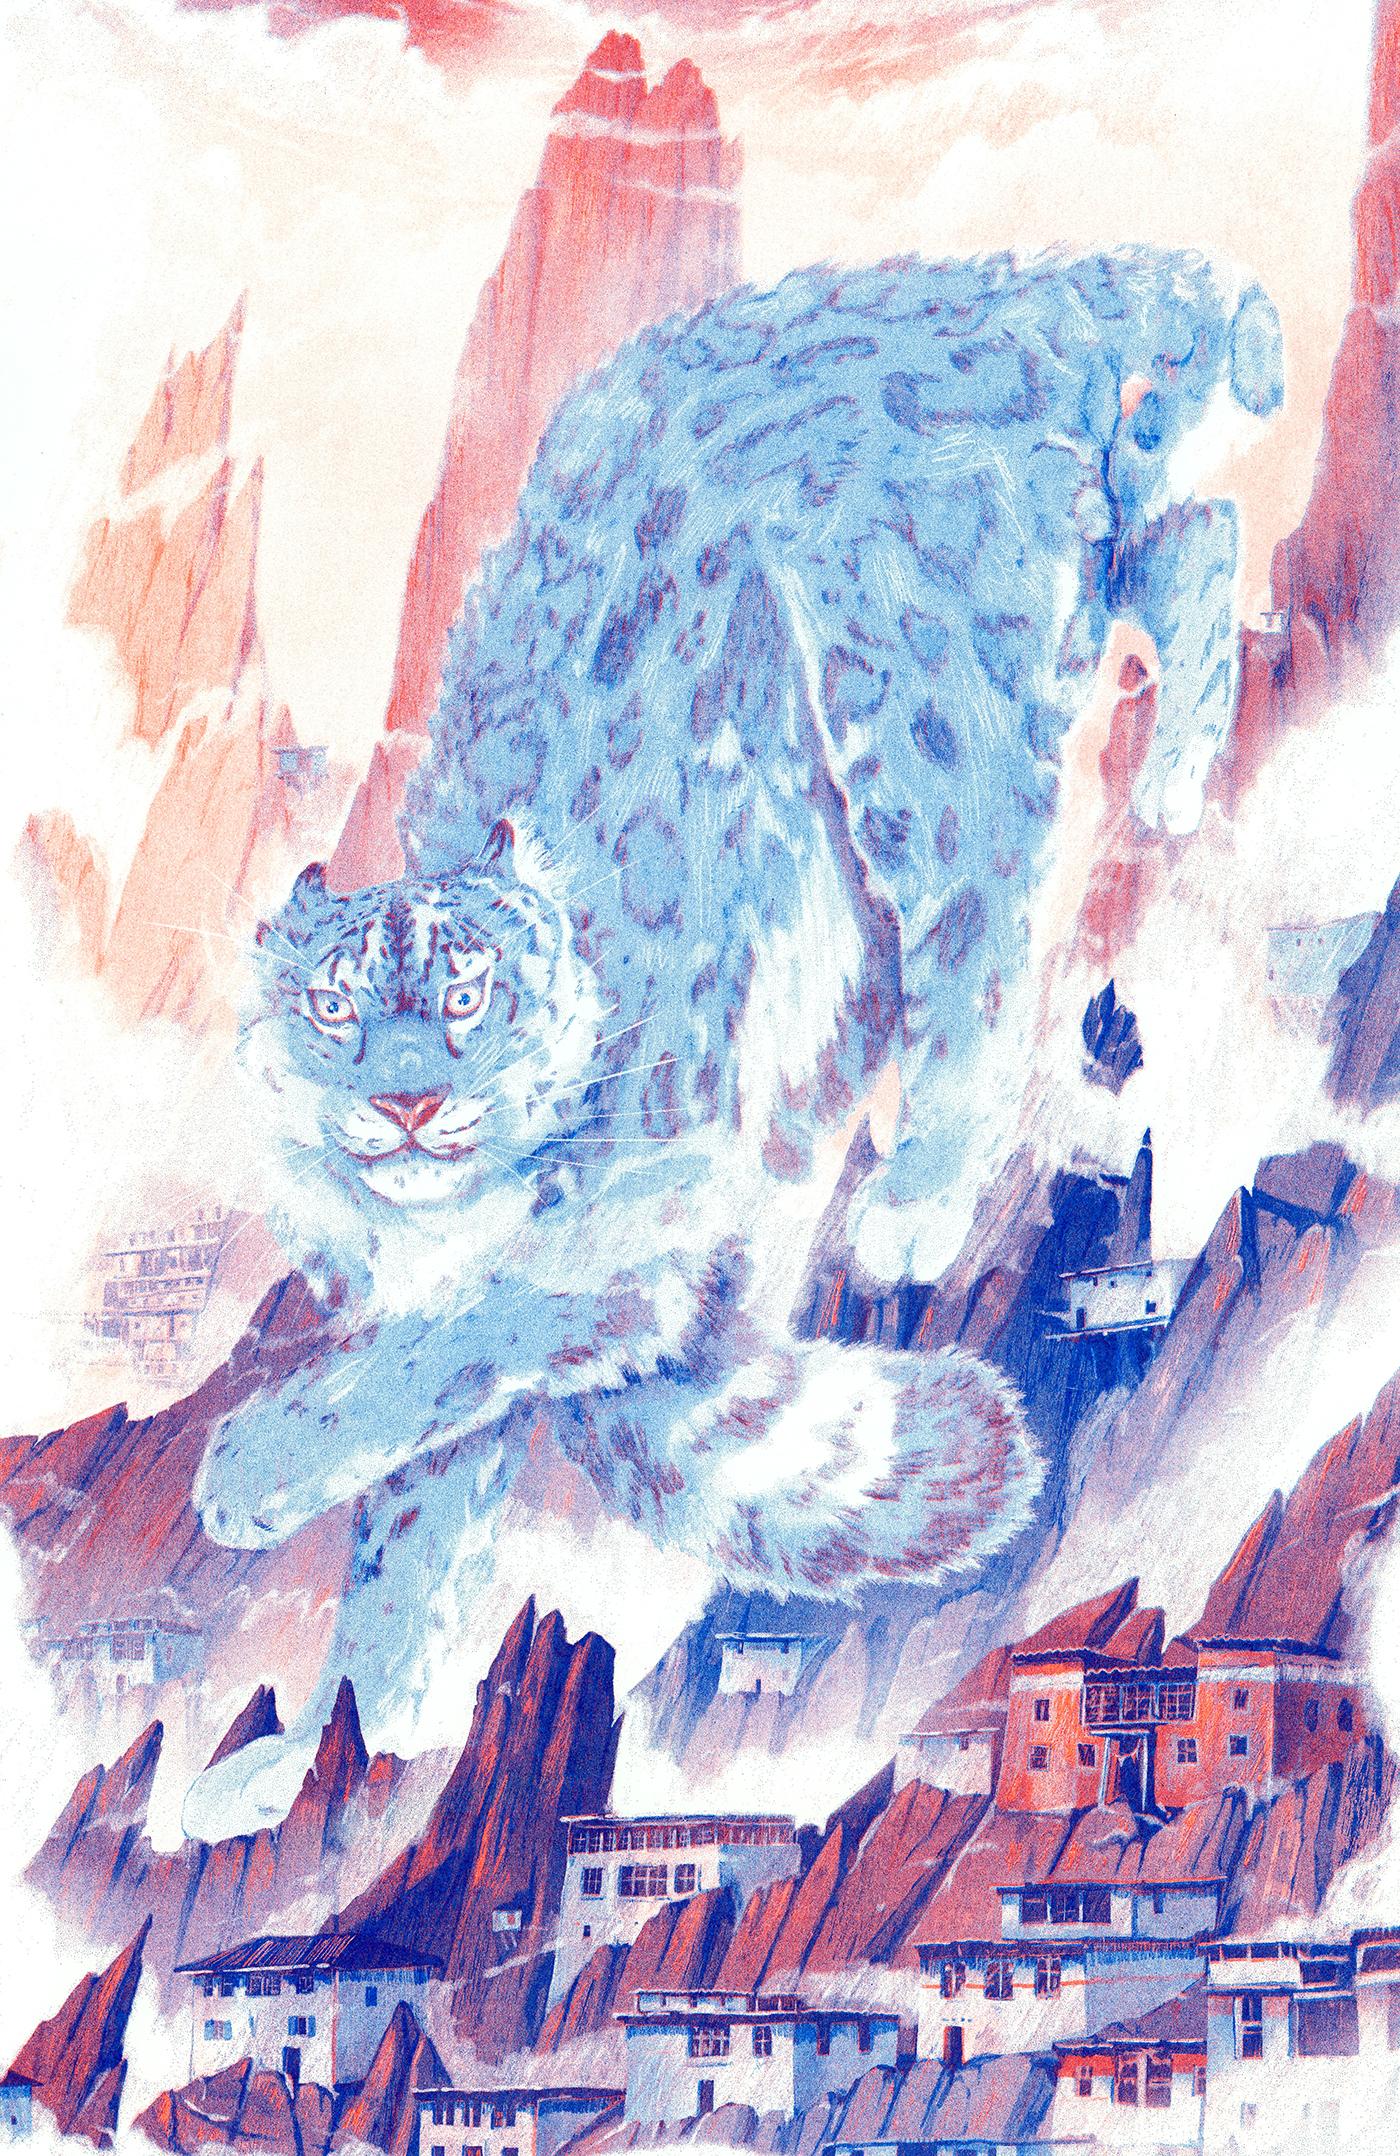 Snow Leopard. 11x17. 2 Colour Risograph. $20 + Shipping